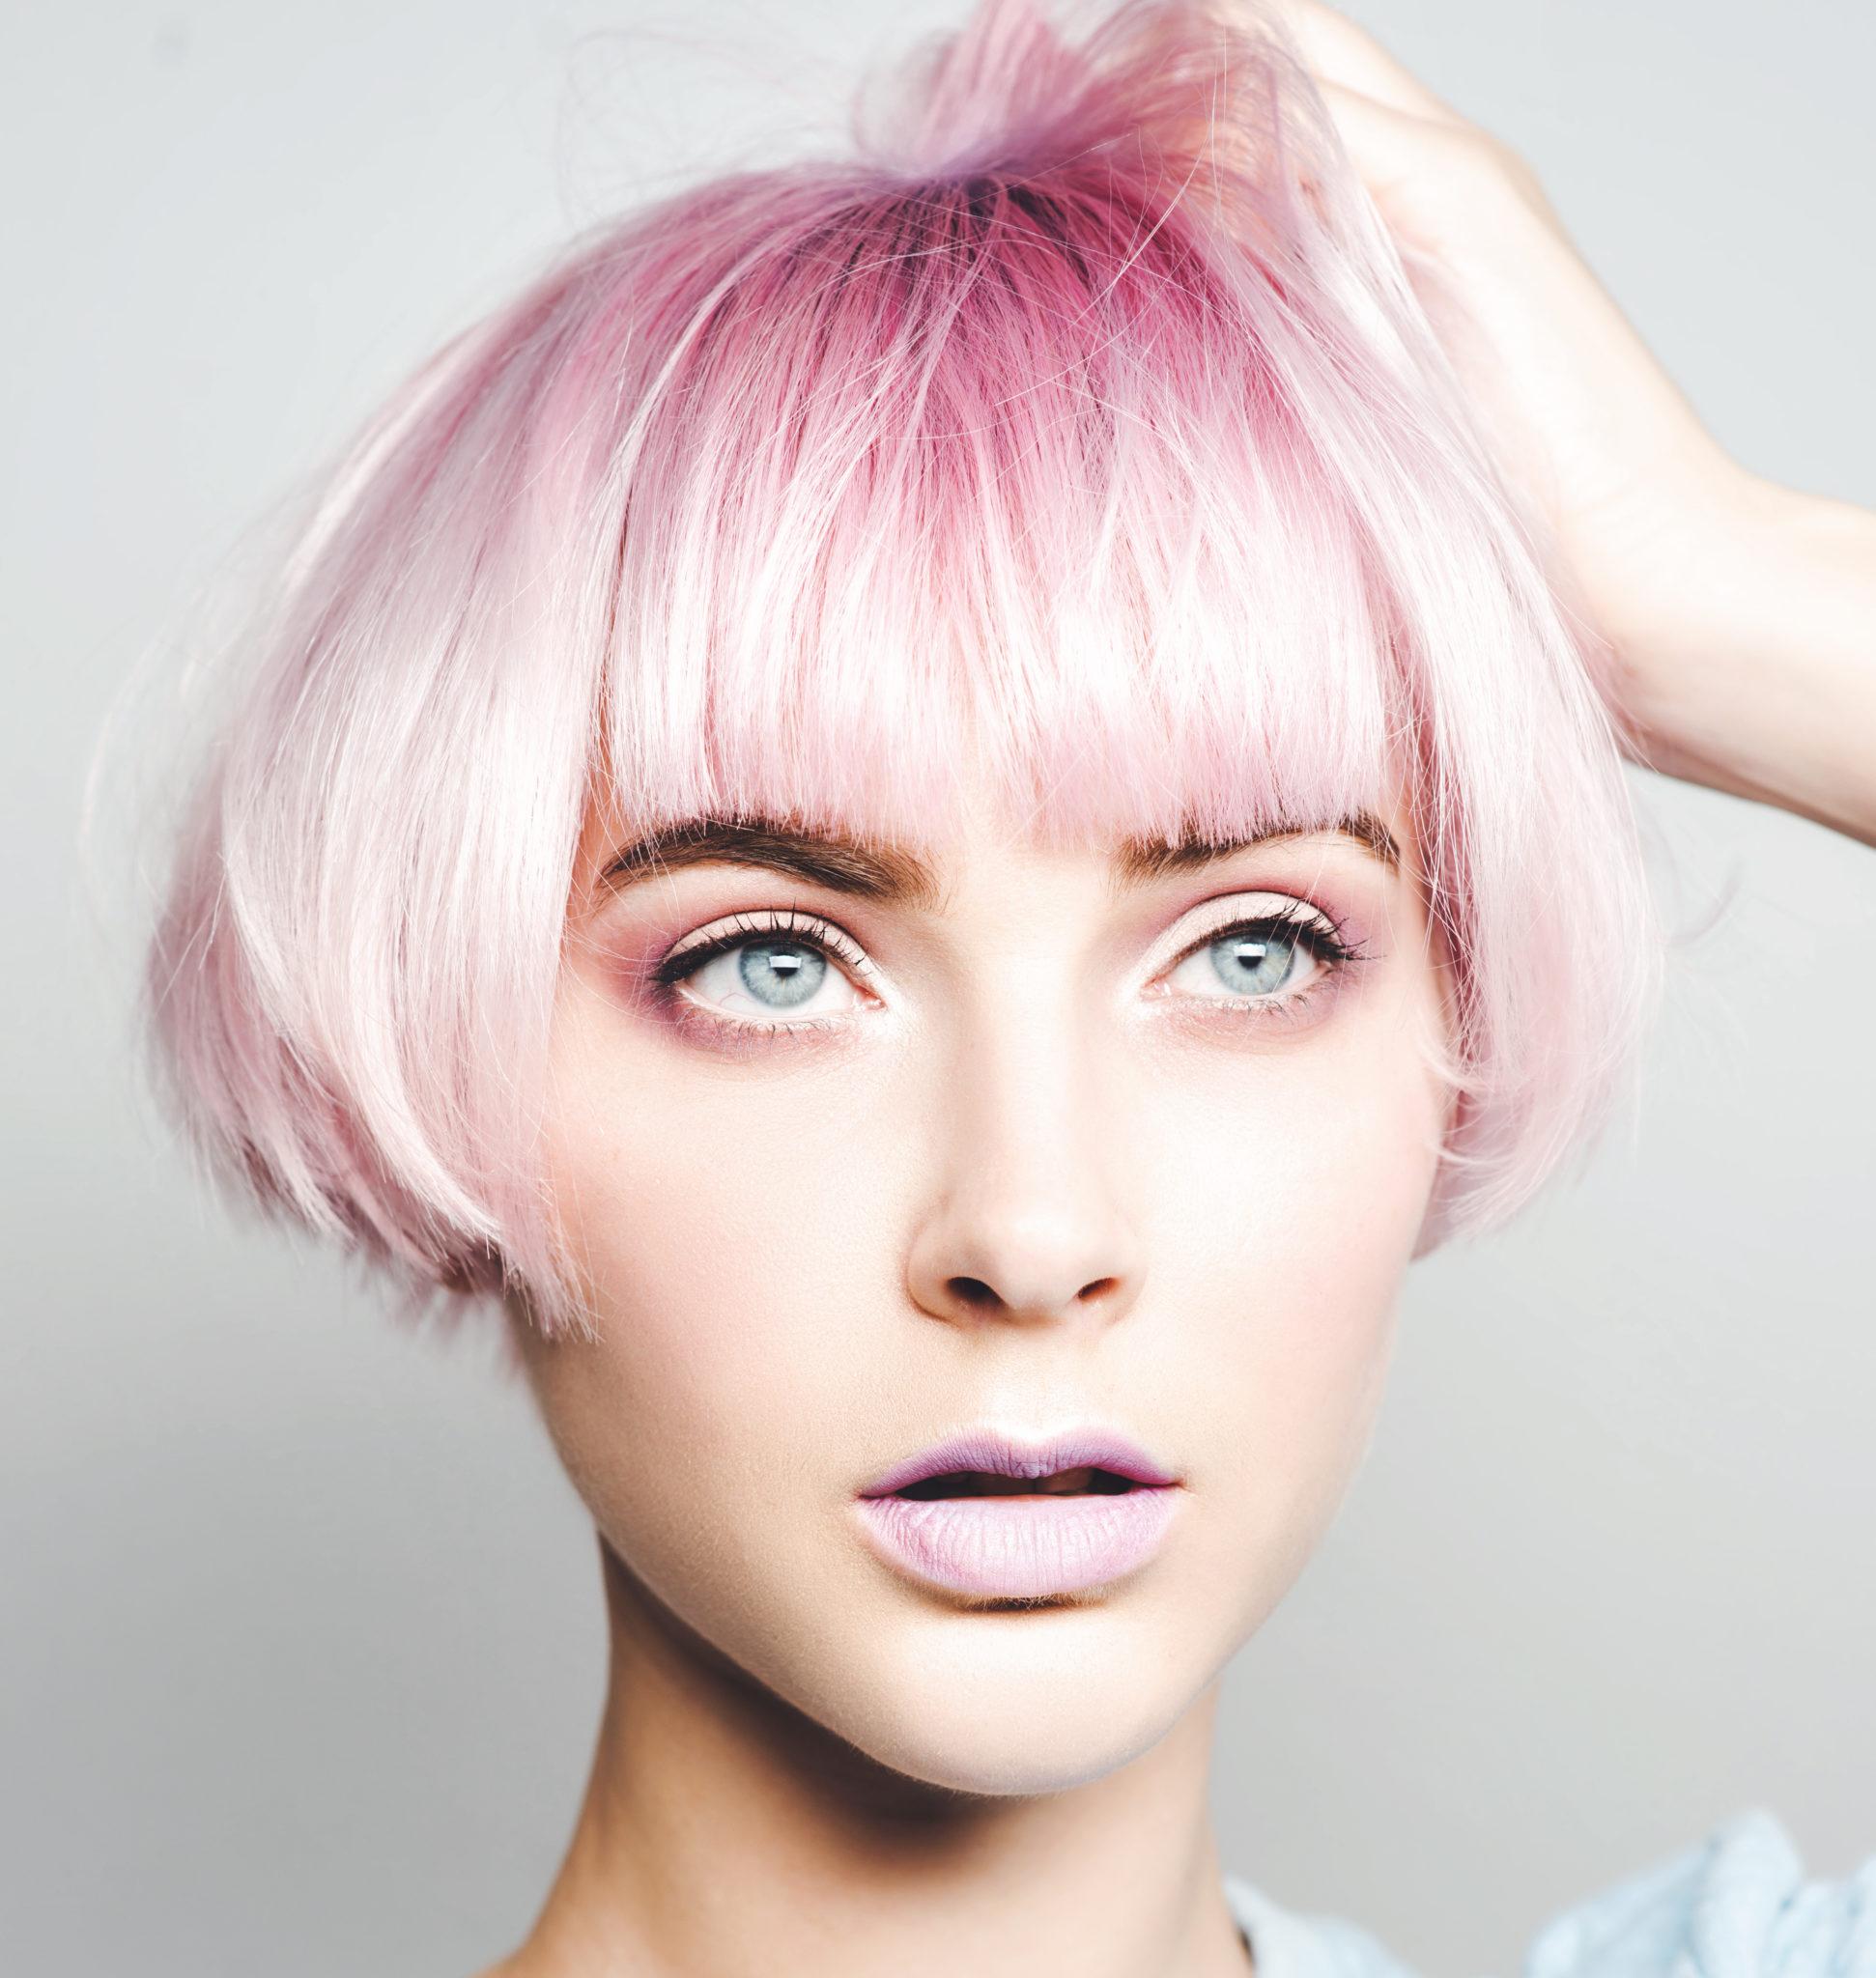 Тренды челок 2018: подбираем форму по типу лица